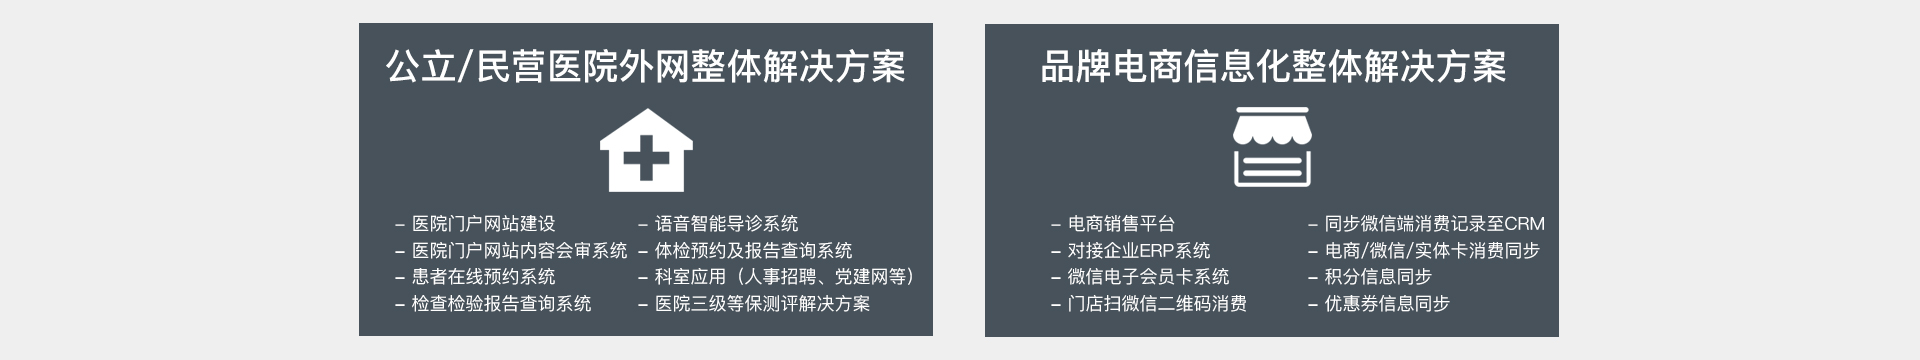 index_04.jpg